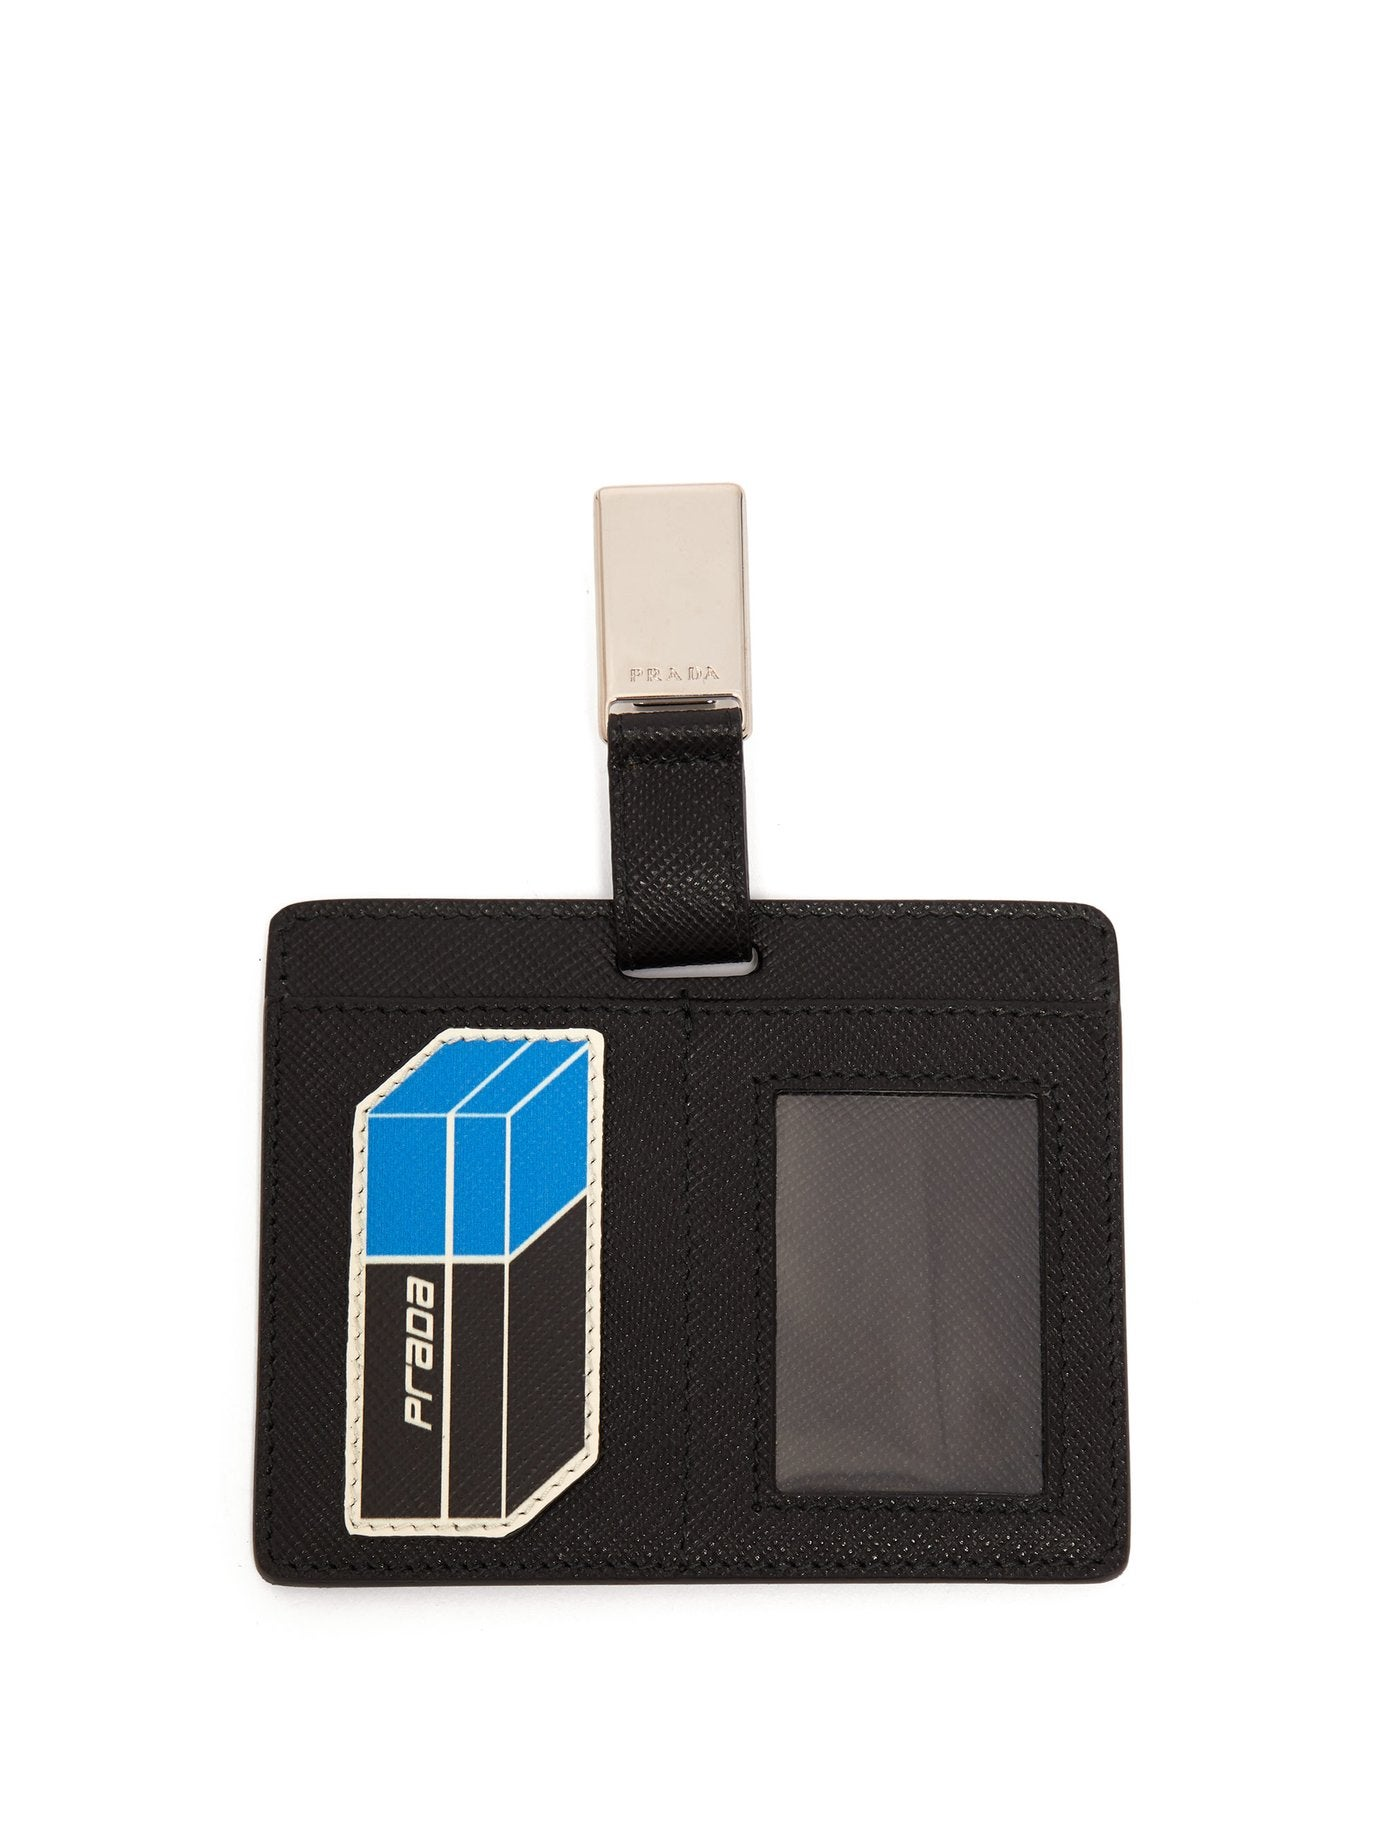 7bf807612926 Prada + Saffiano Leather Clip-on Cardholder Badge